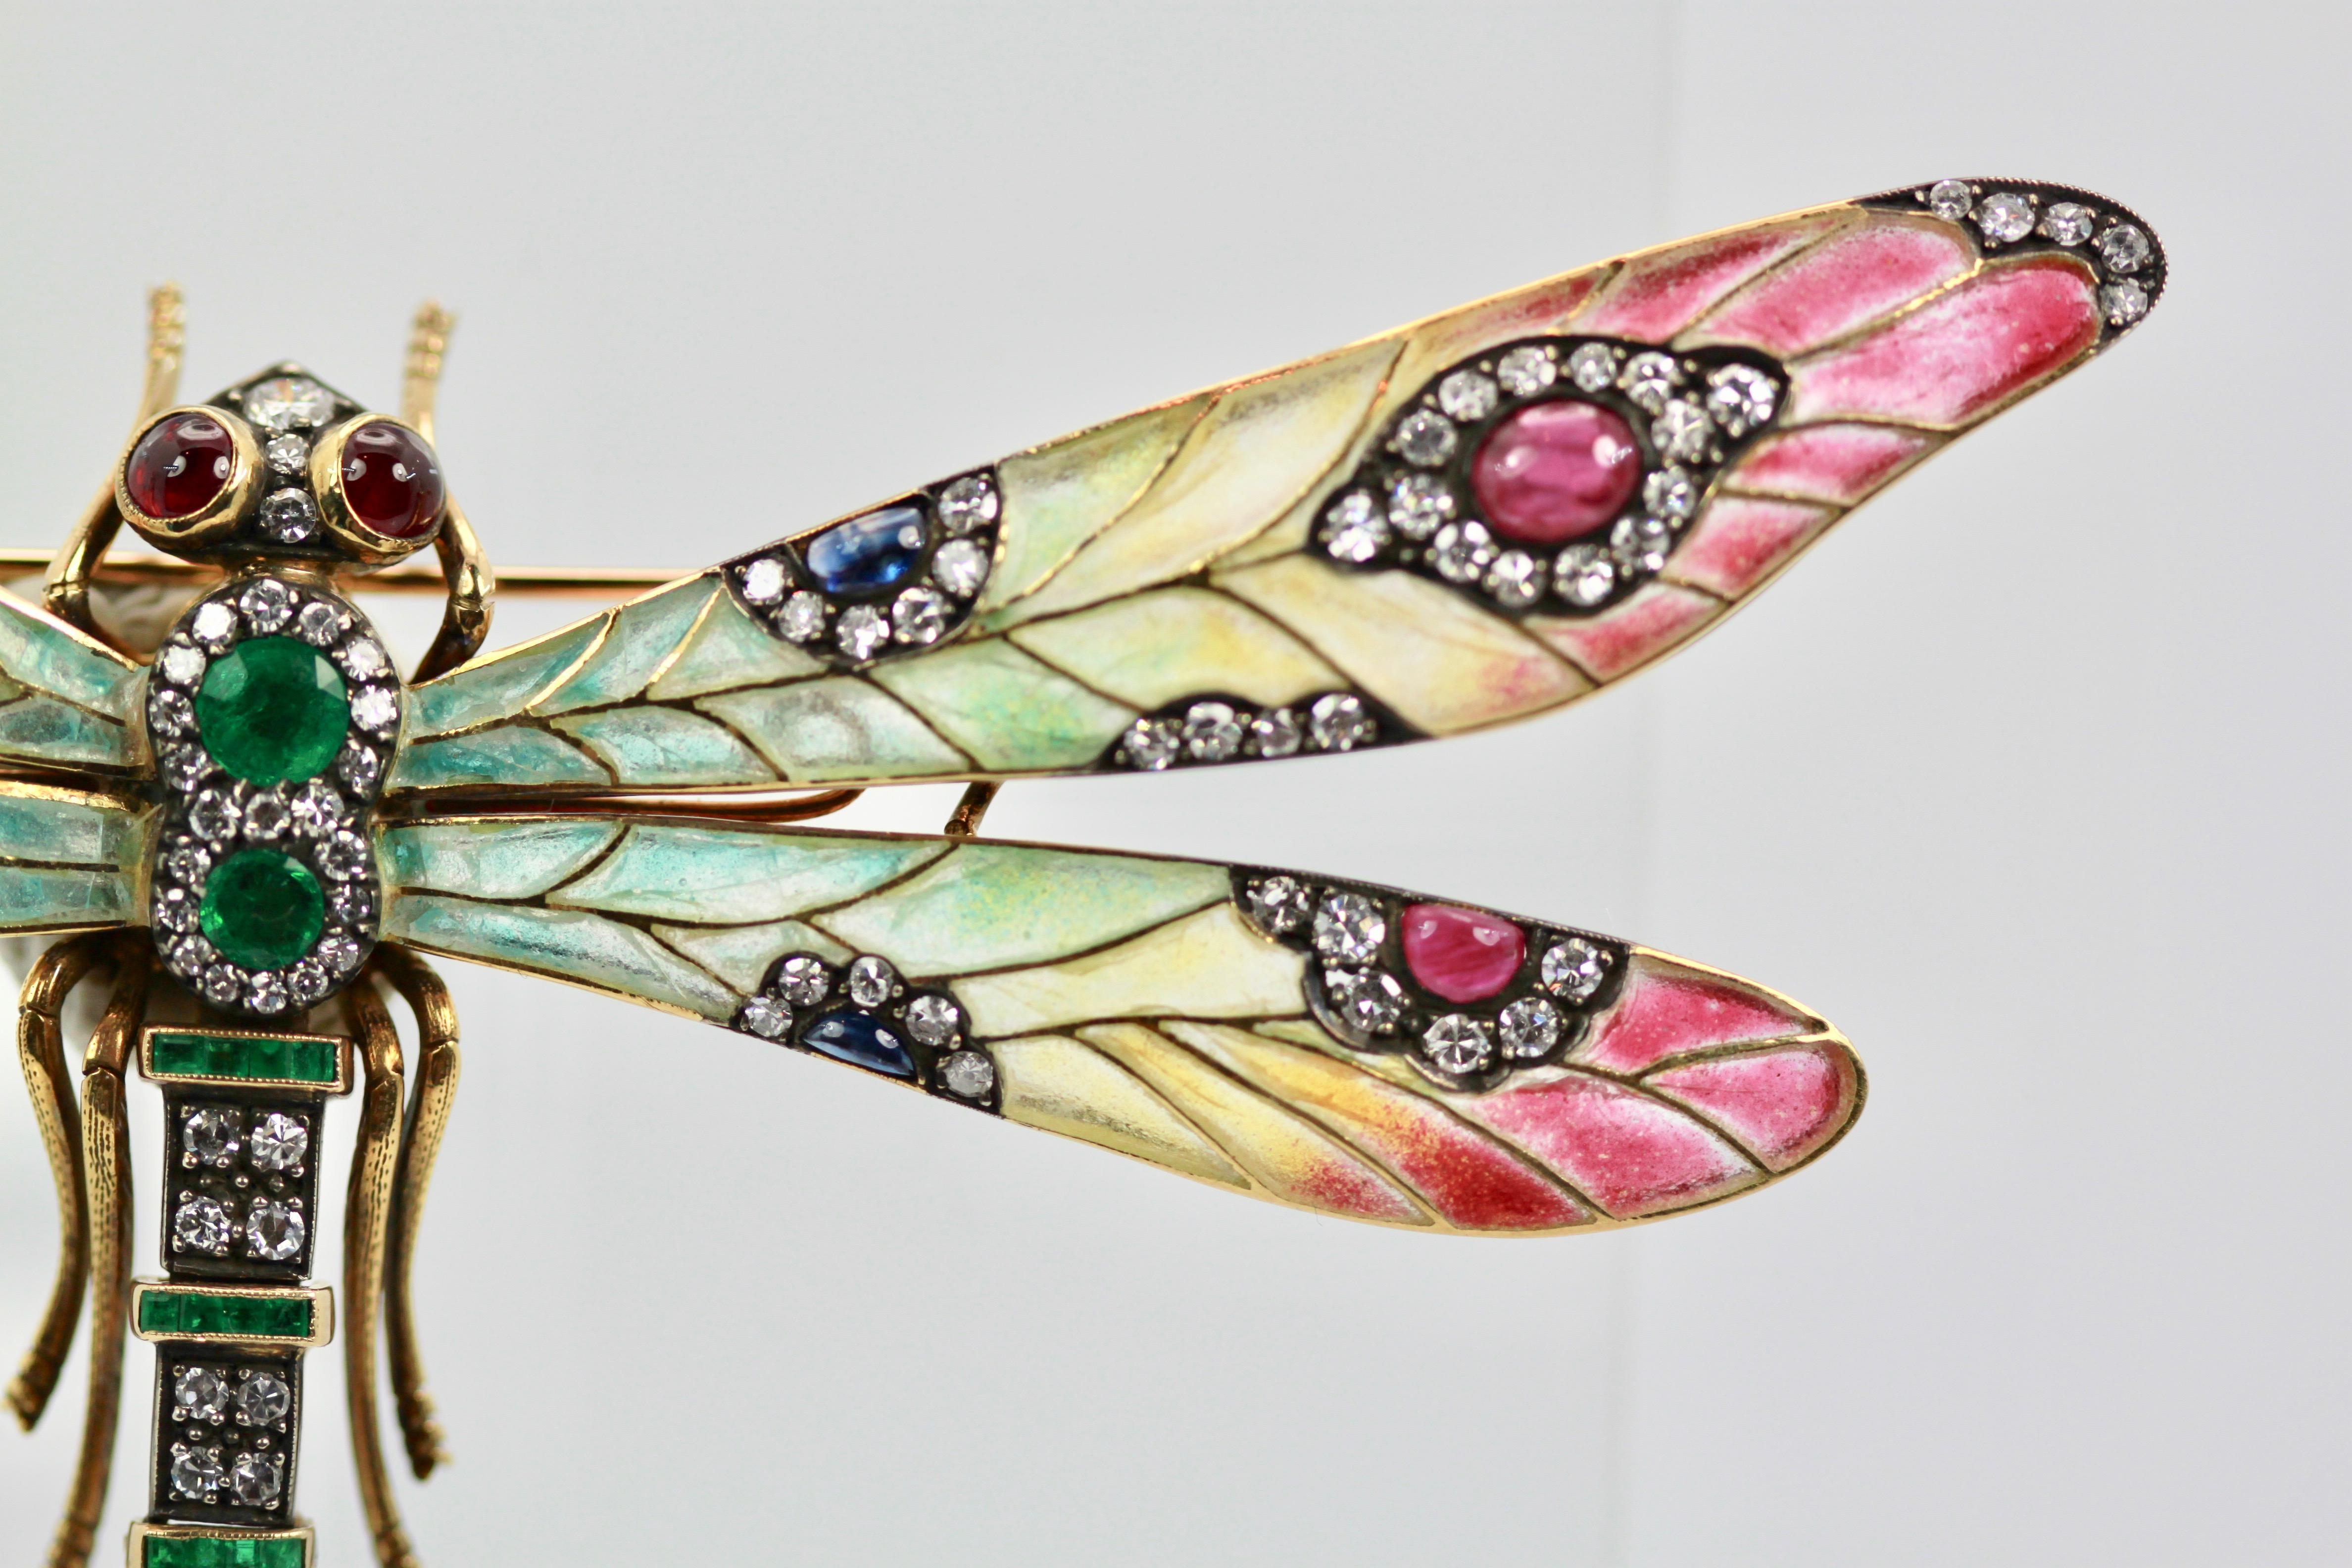 44a57f87eb1 Plique à Jour Huge Diamond Gemstone Dragonfly Brooch 18 Karat For Sale at  1stdibs